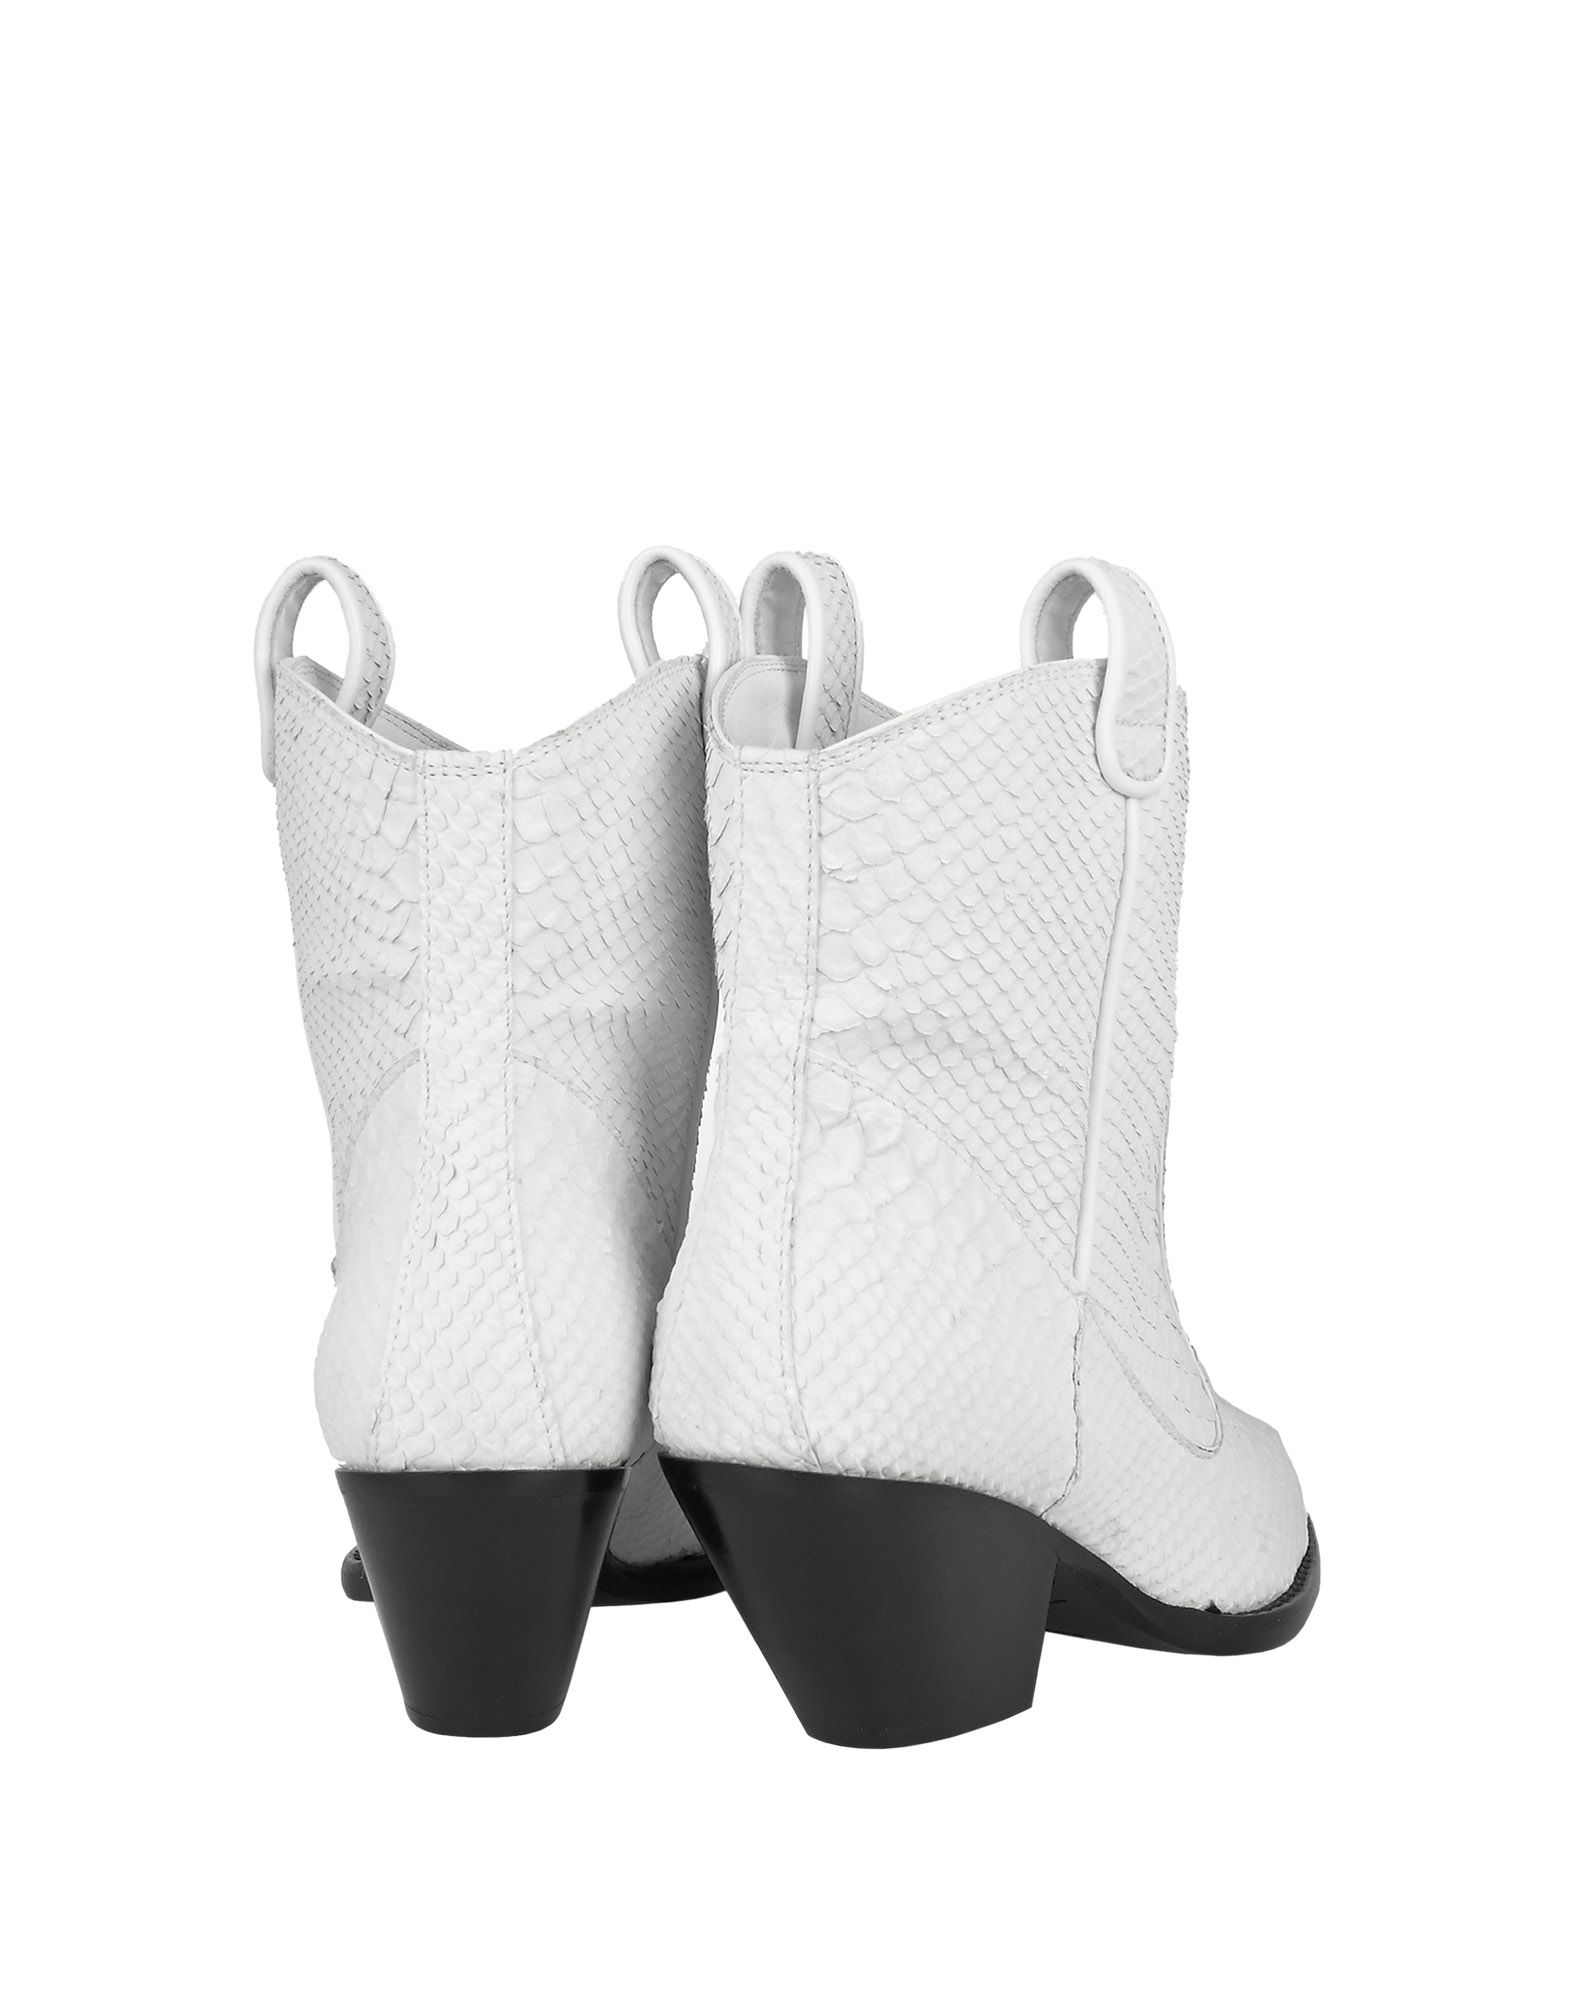 Giuseppe Zanotti Stiefelette Damen Schuhe  11524372LJGünstige gut aussehende Schuhe Damen 3de5c9